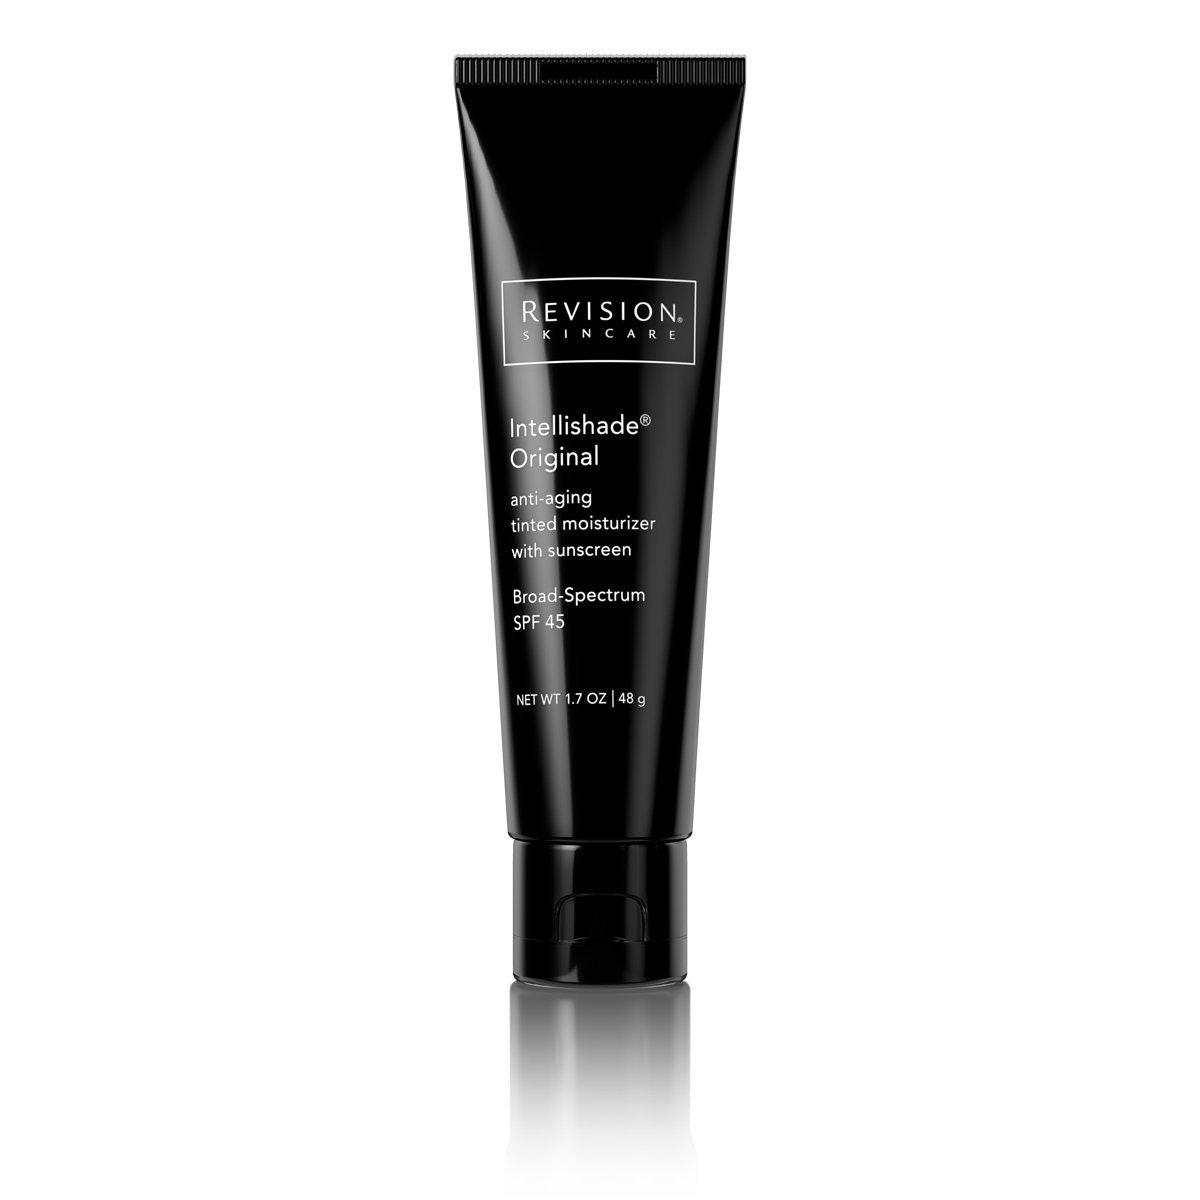 Intellishade® Original anti-aging tinted daily moisturizer with sunscreen